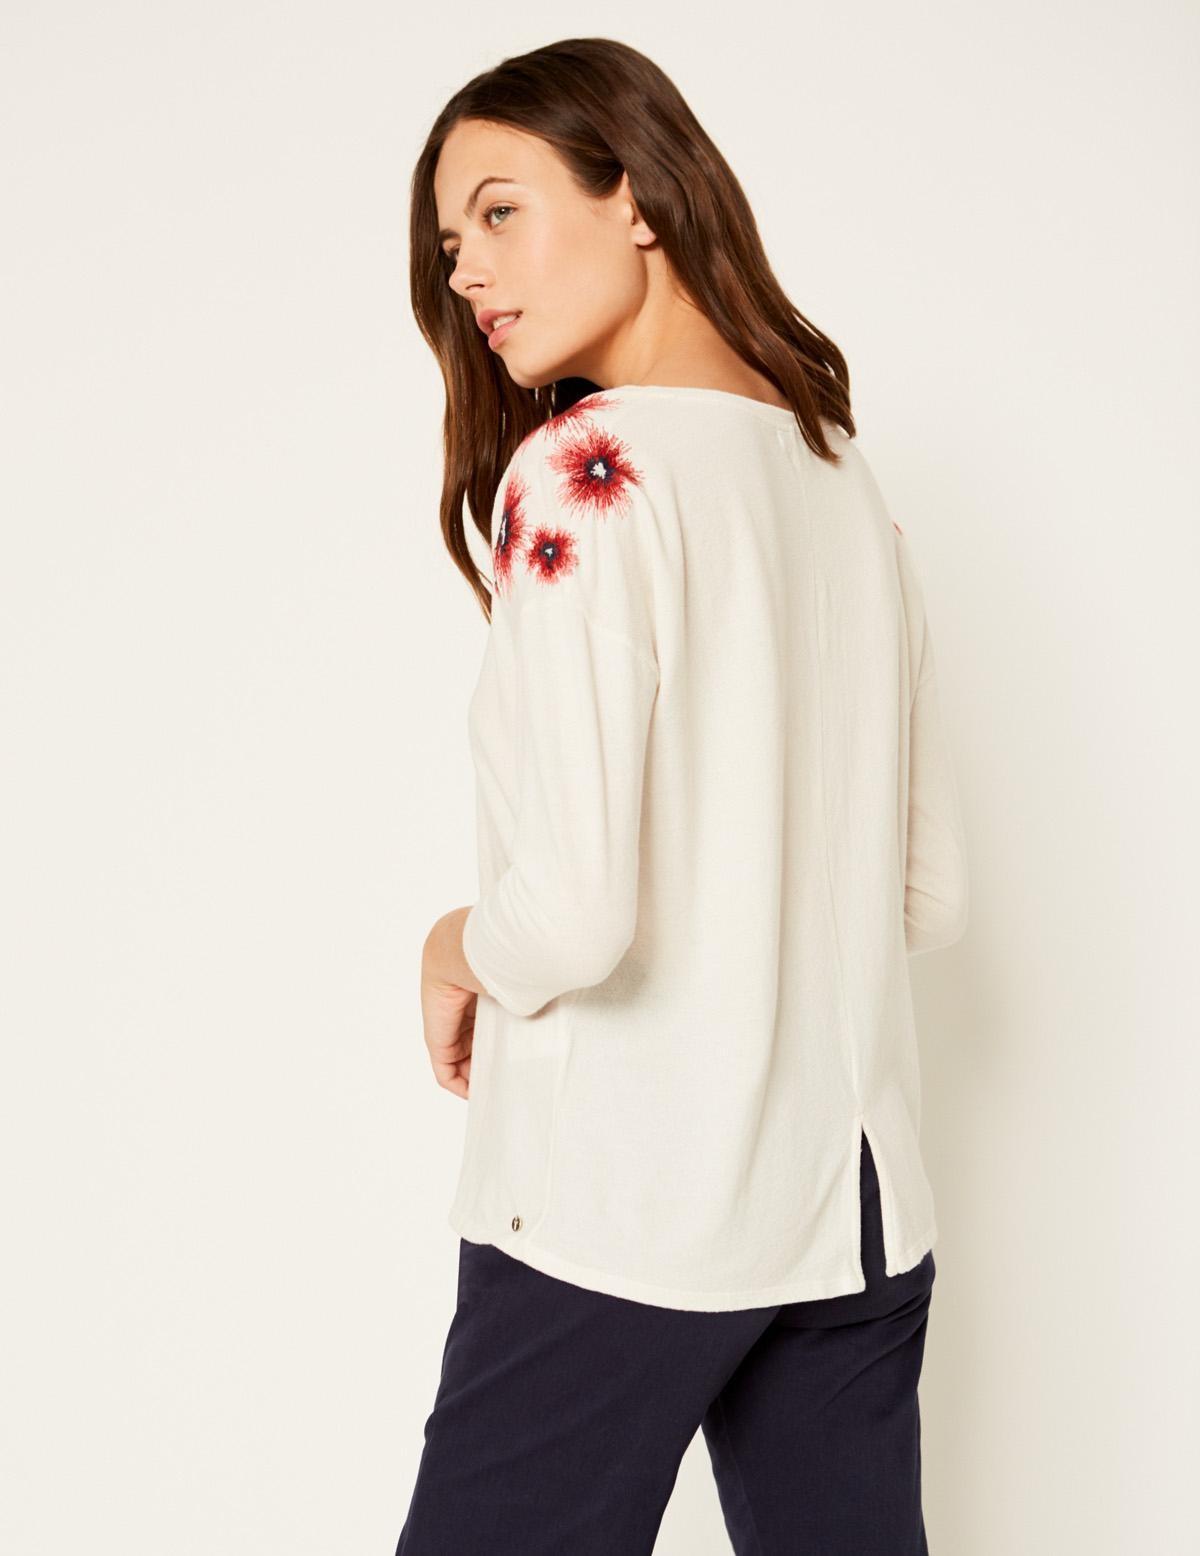 Camiseta bordado flores - Ítem1